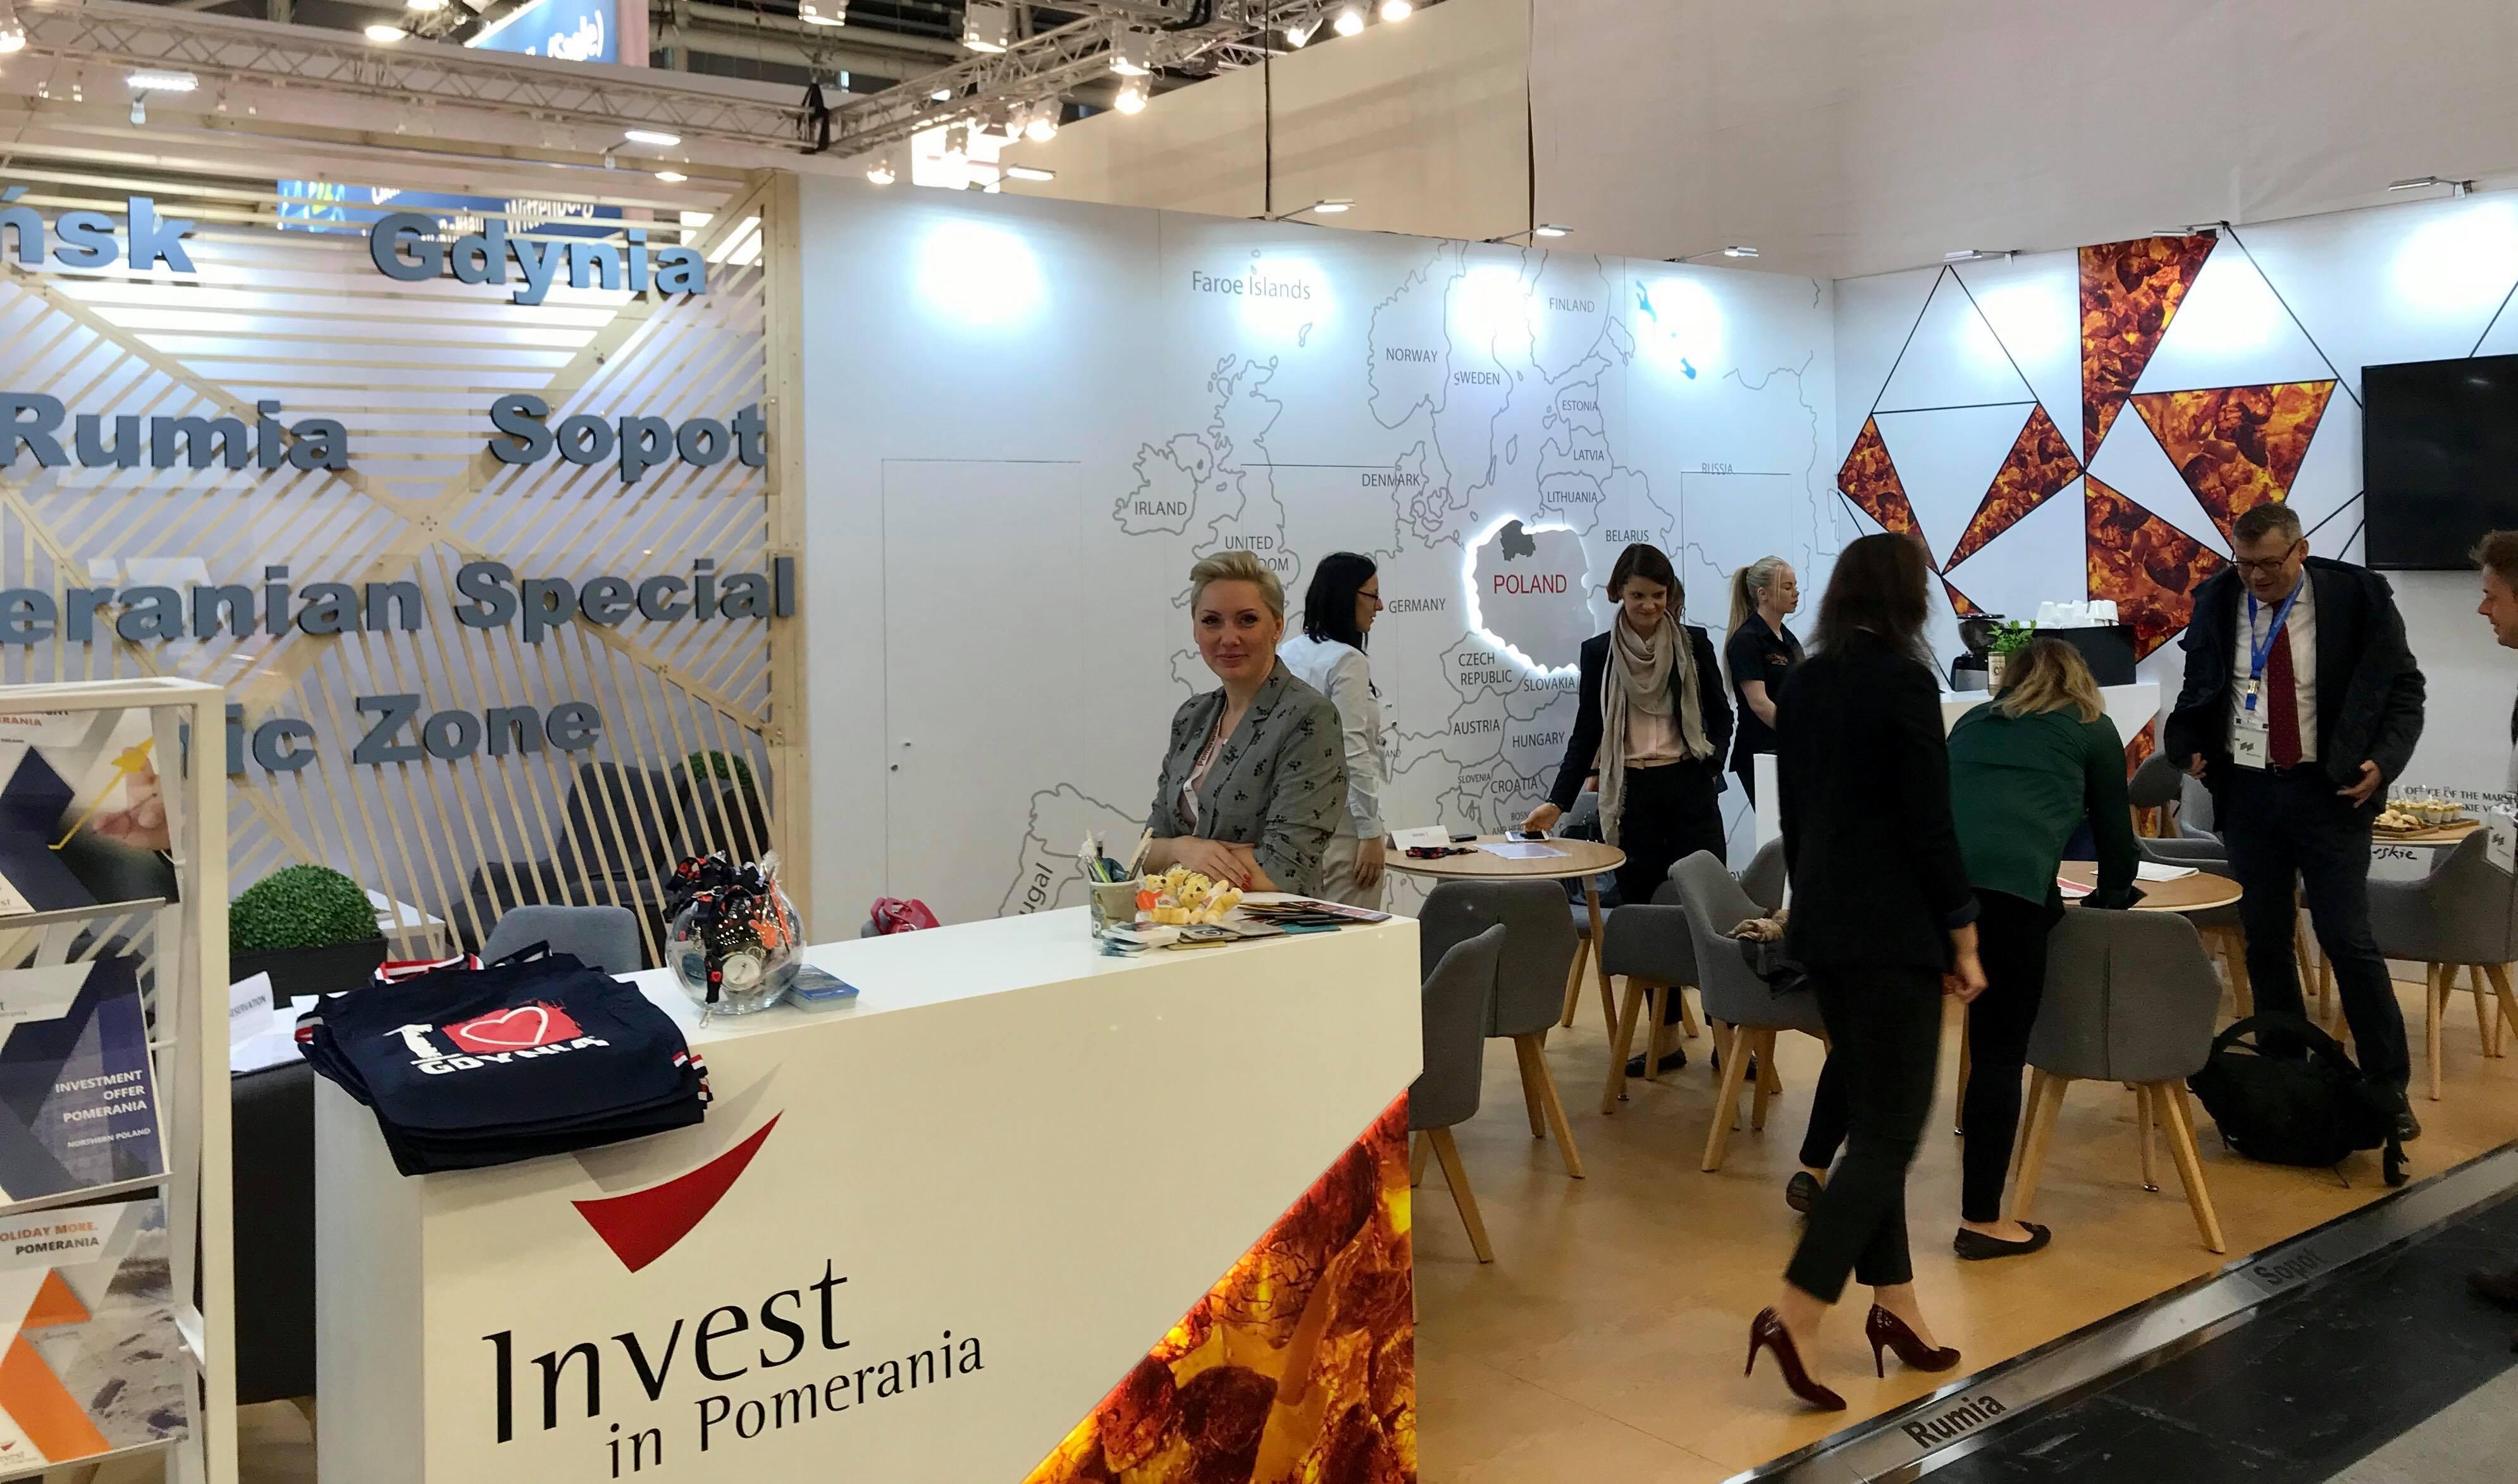 Stoisko Invest in Pomerania na targach w Monachium, fot. Maja Studzińska